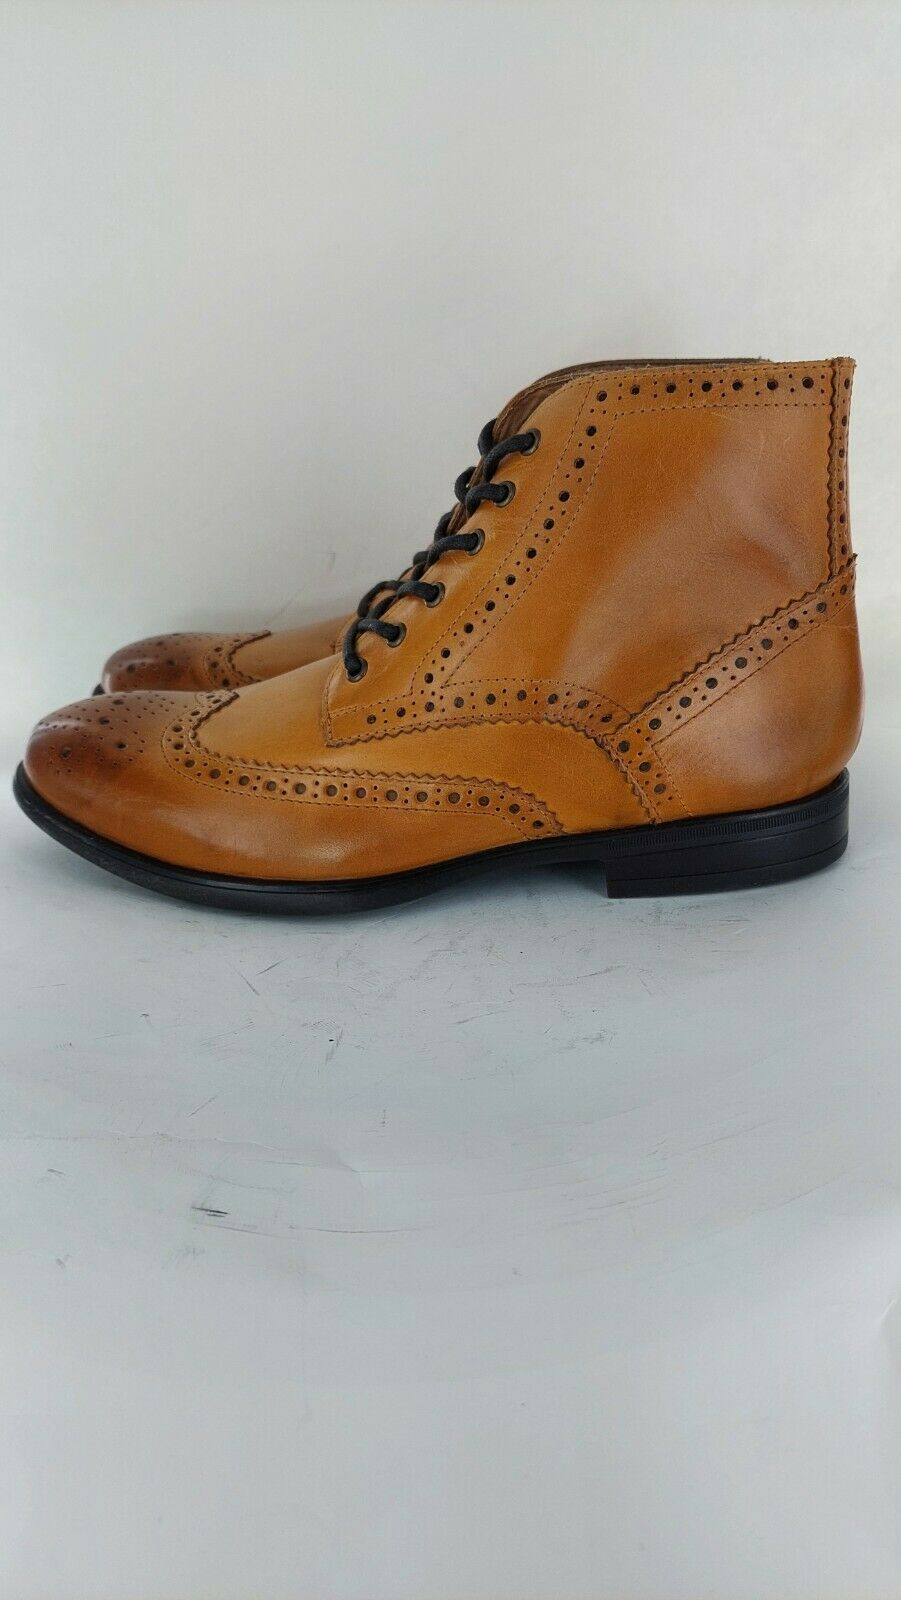 Mister Carlo LEONARDO Mens Zip Up Smart Brogue Ankle Boots UK Size 9#833